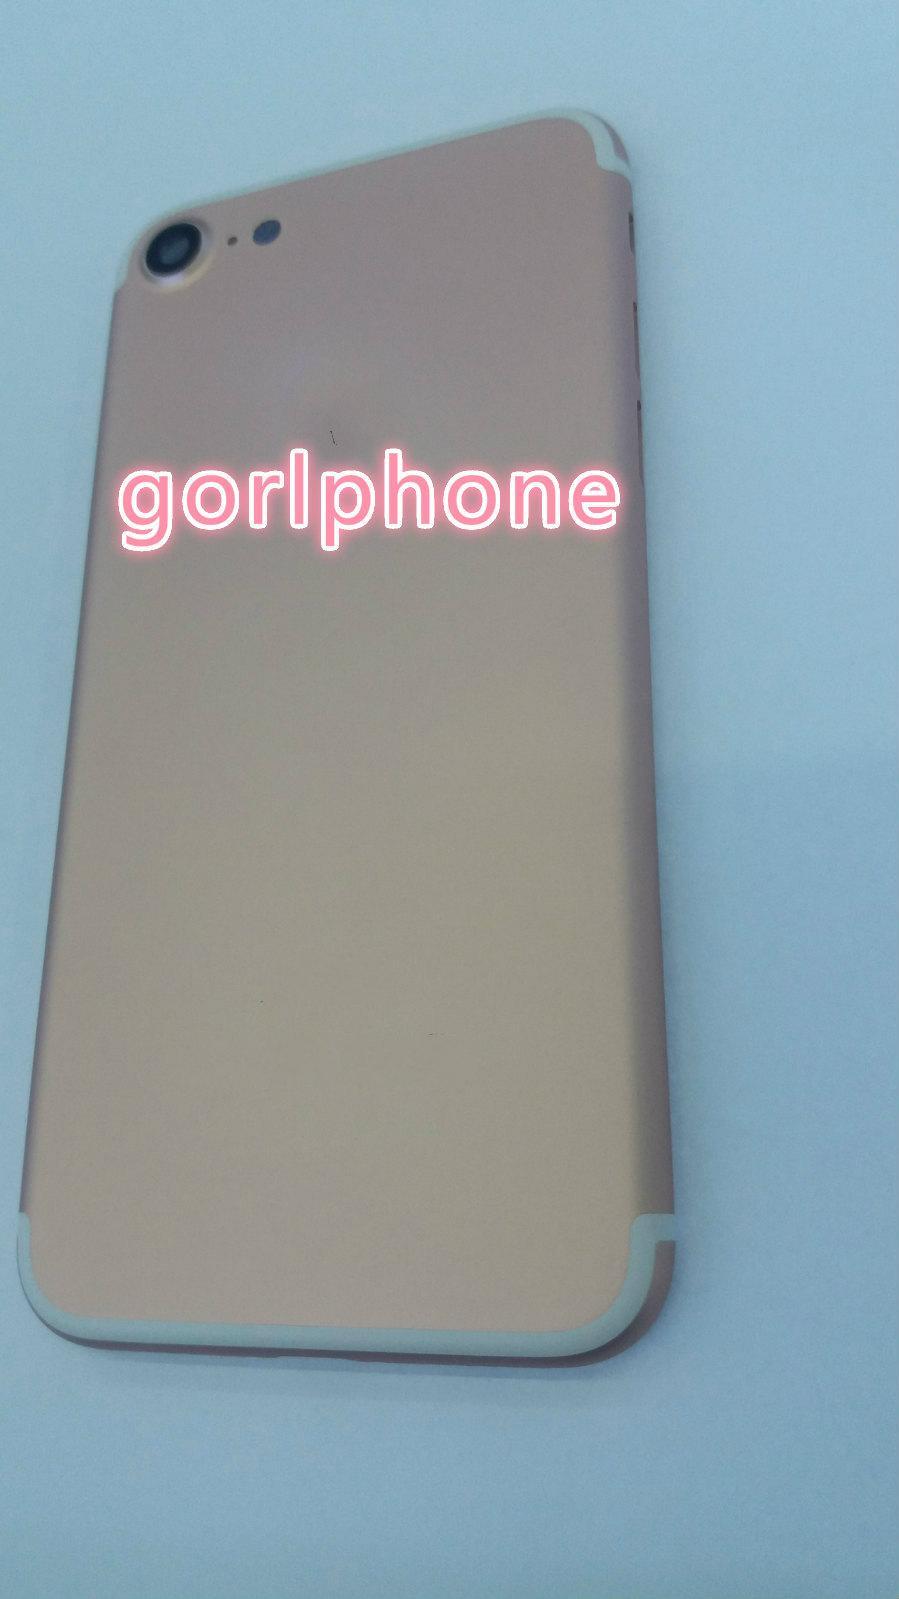 Verdadero original Plating Volver cubierta de la cubierta de la piel puerta de la batería para el iPhone 7 7+ caja móvil original del teléfono celular orden mixta